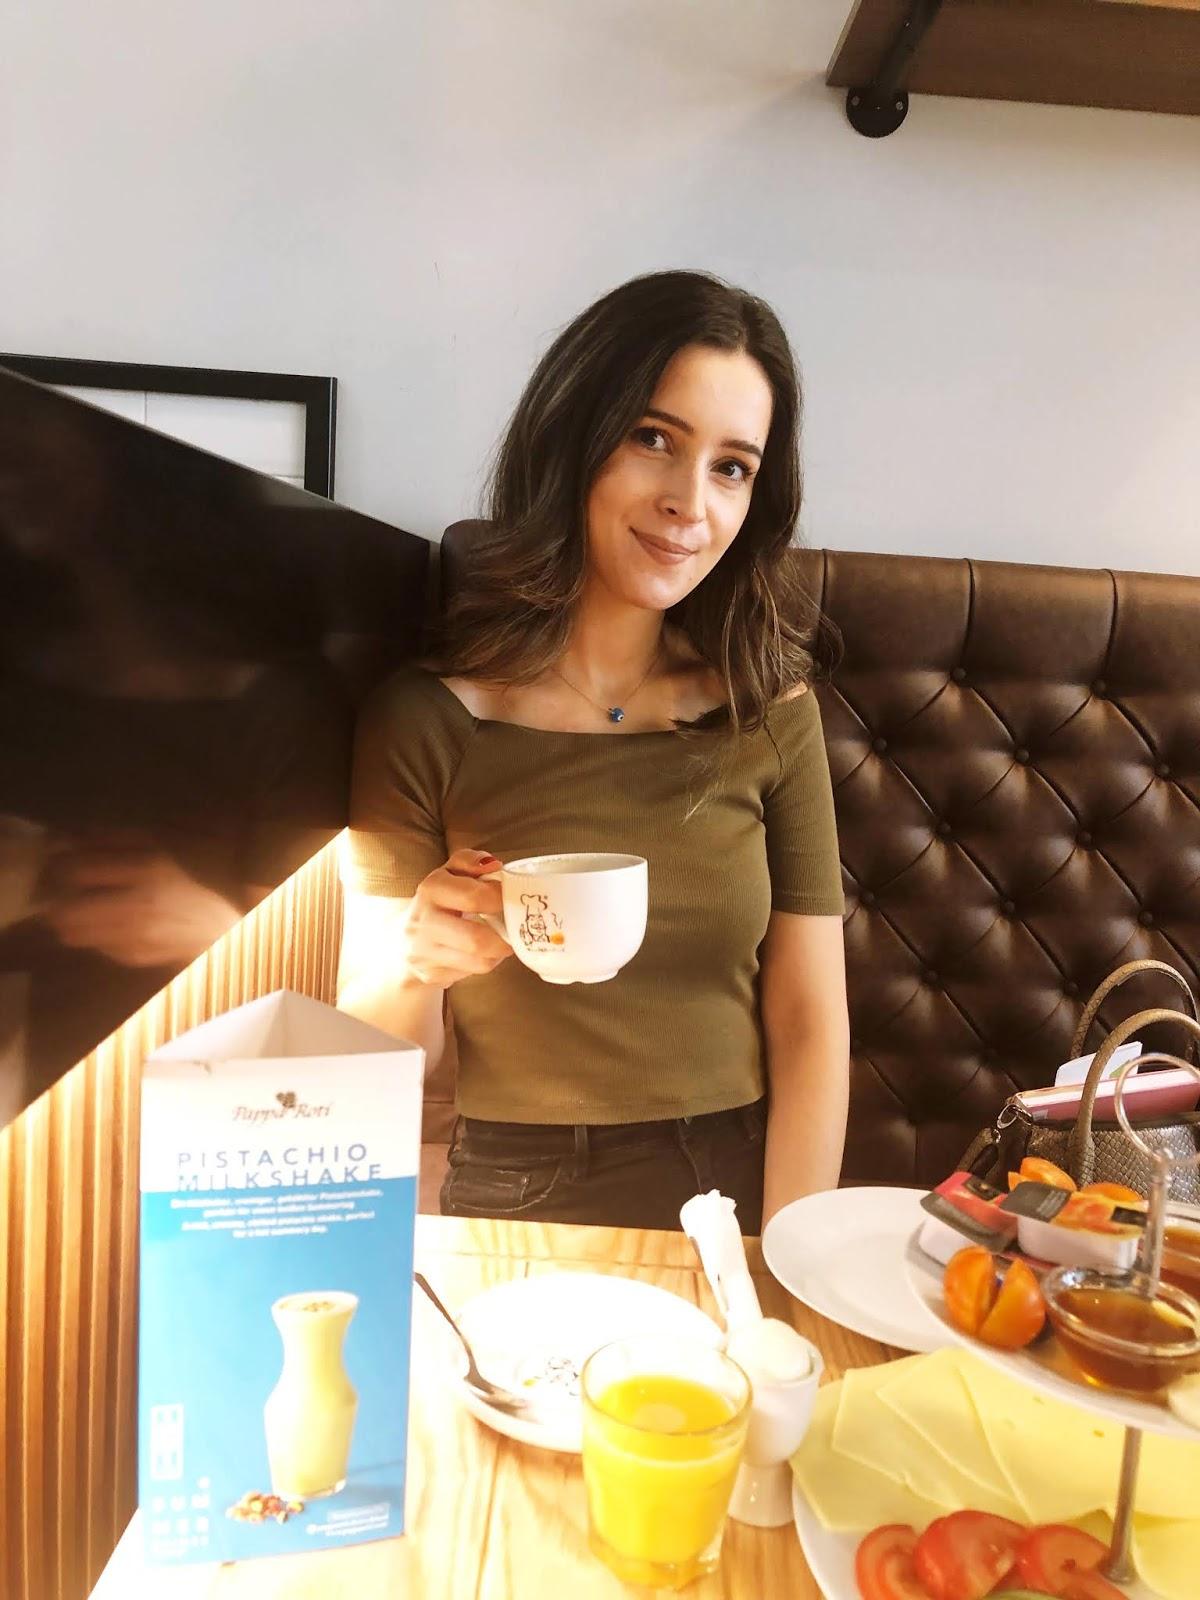 Frühstück-Kaffee-Bun-Pappa-Roti